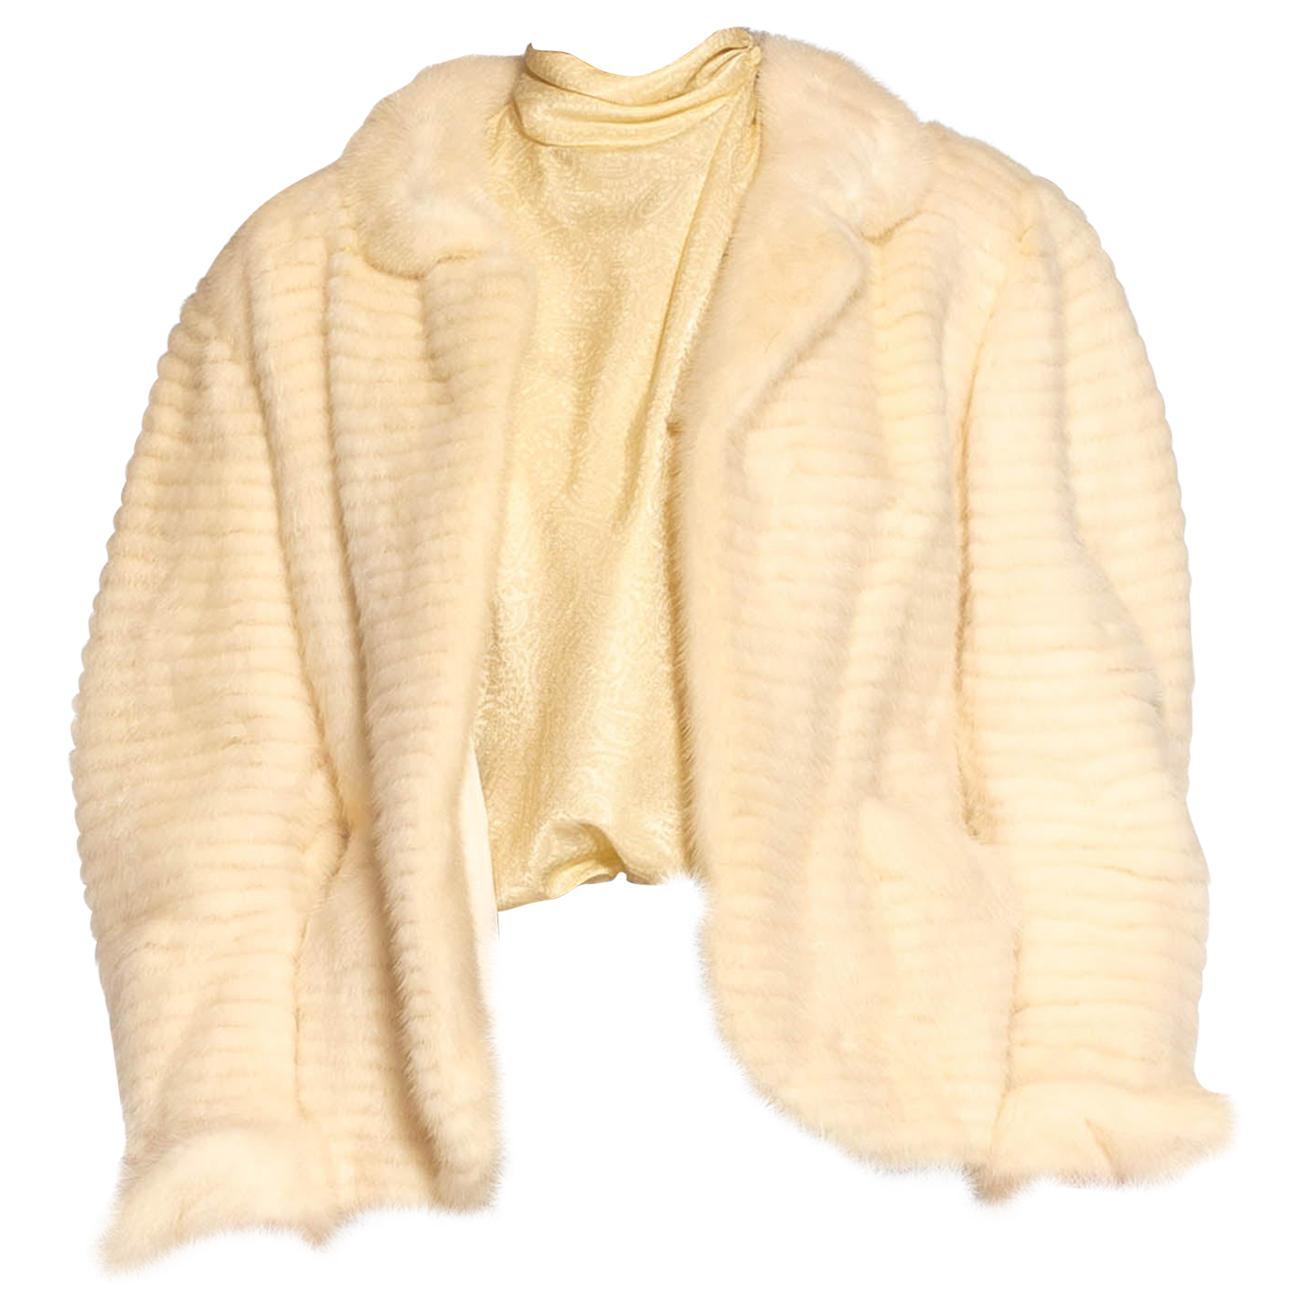 1980S MAXIMILIAN White Mink Fur Perfect Little Jacket